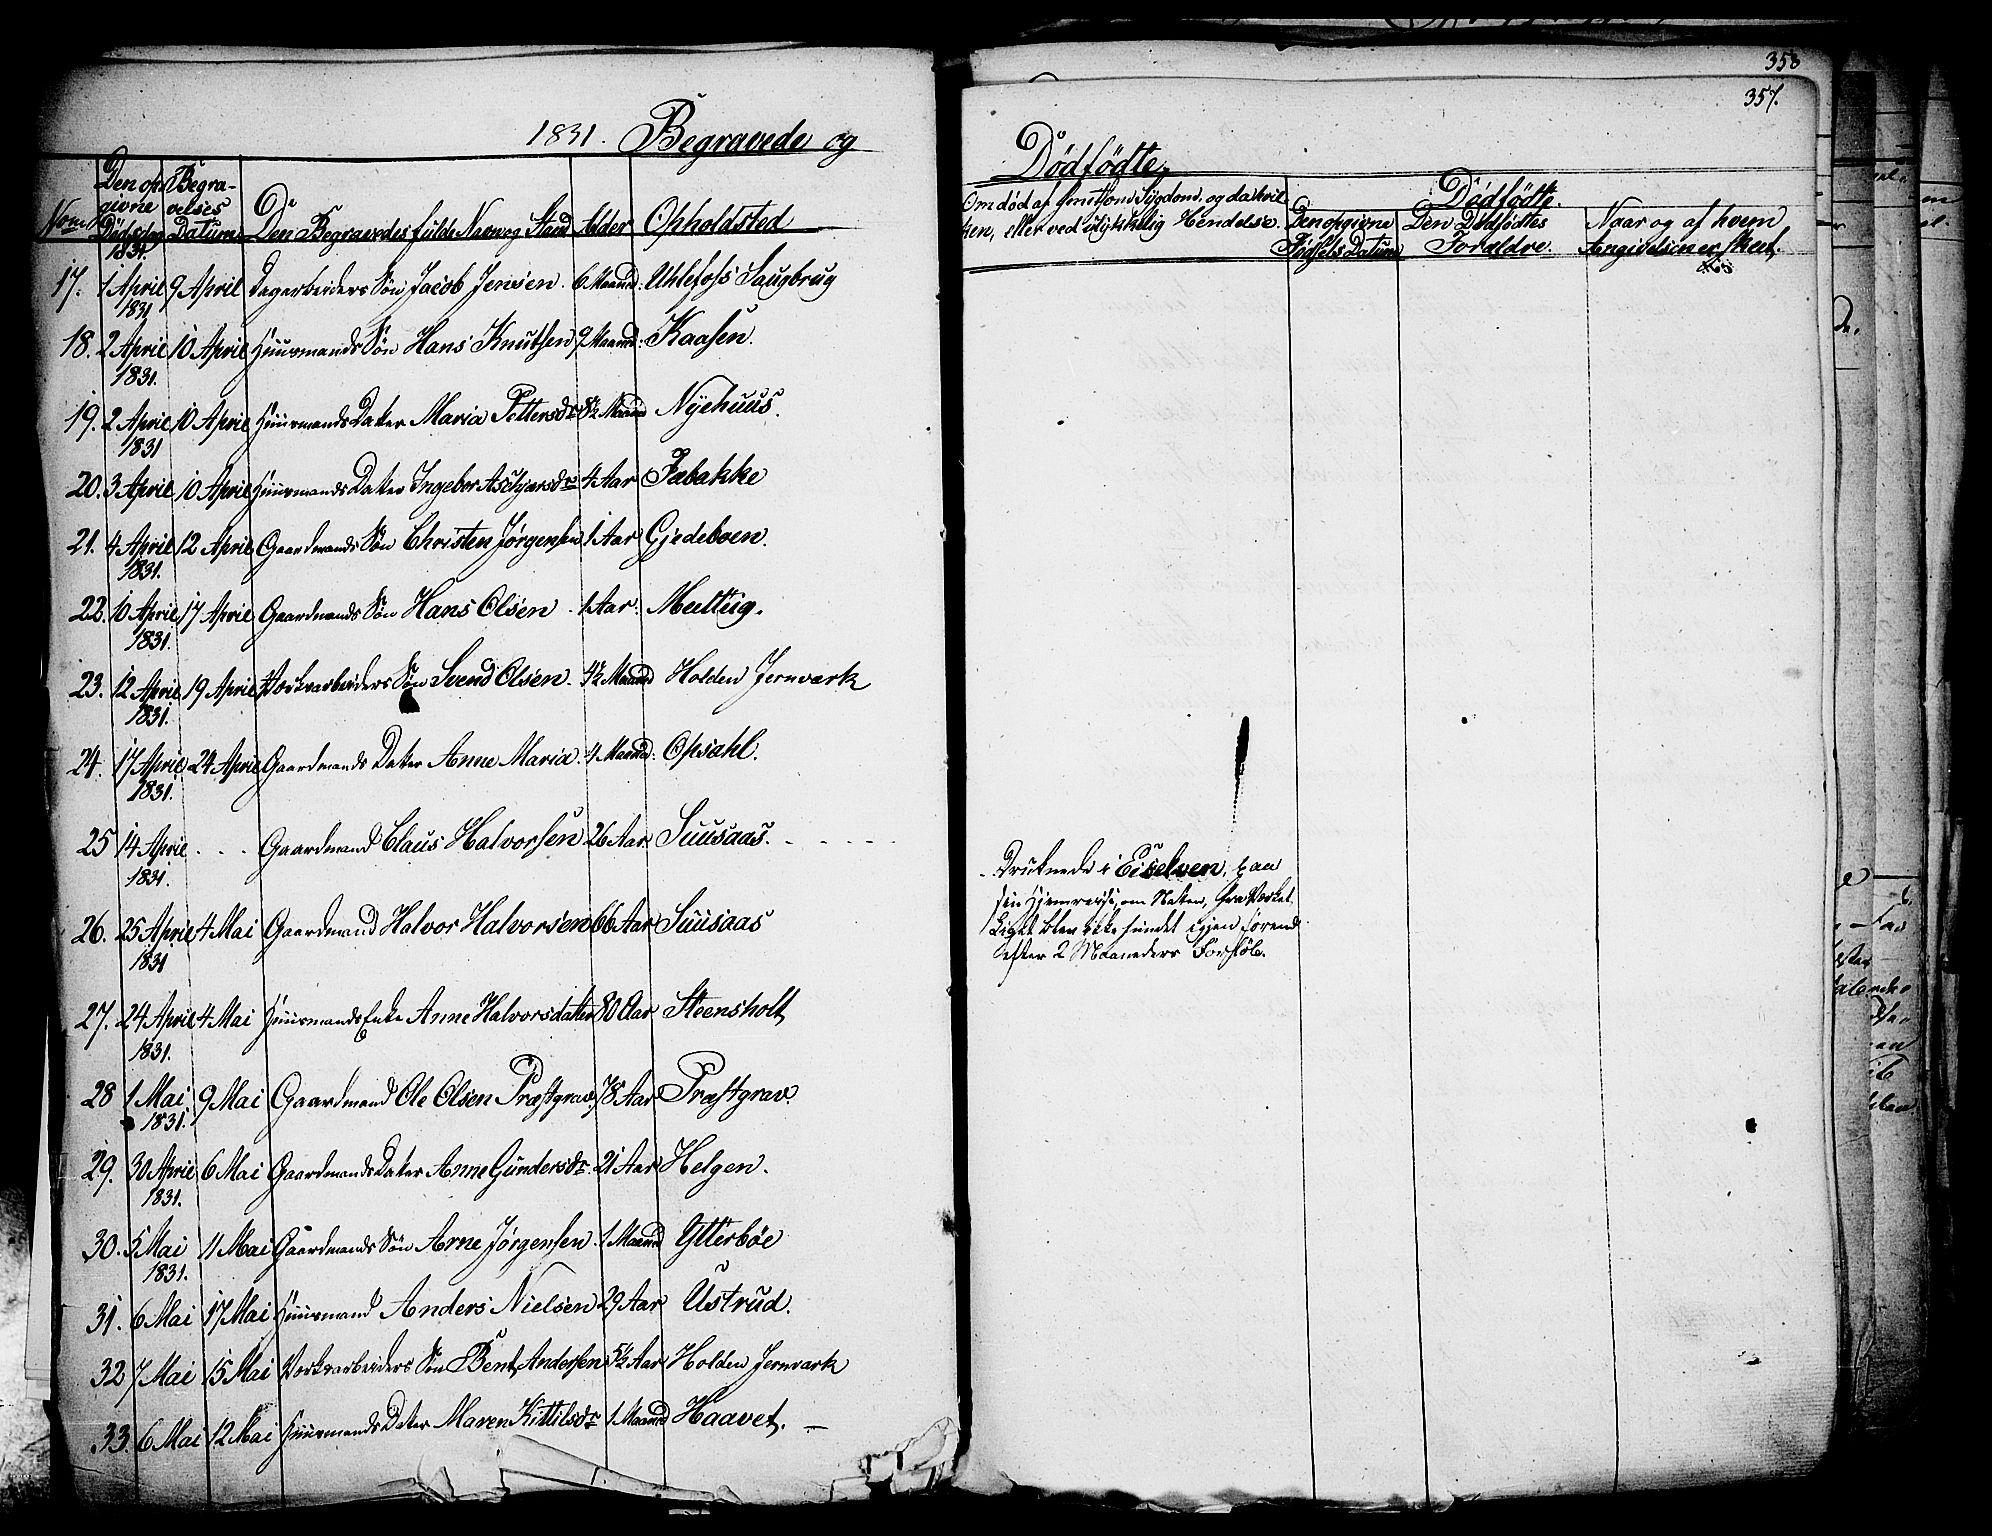 SAKO, Holla kirkebøker, F/Fa/L0004: Ministerialbok nr. 4, 1830-1848, s. 357